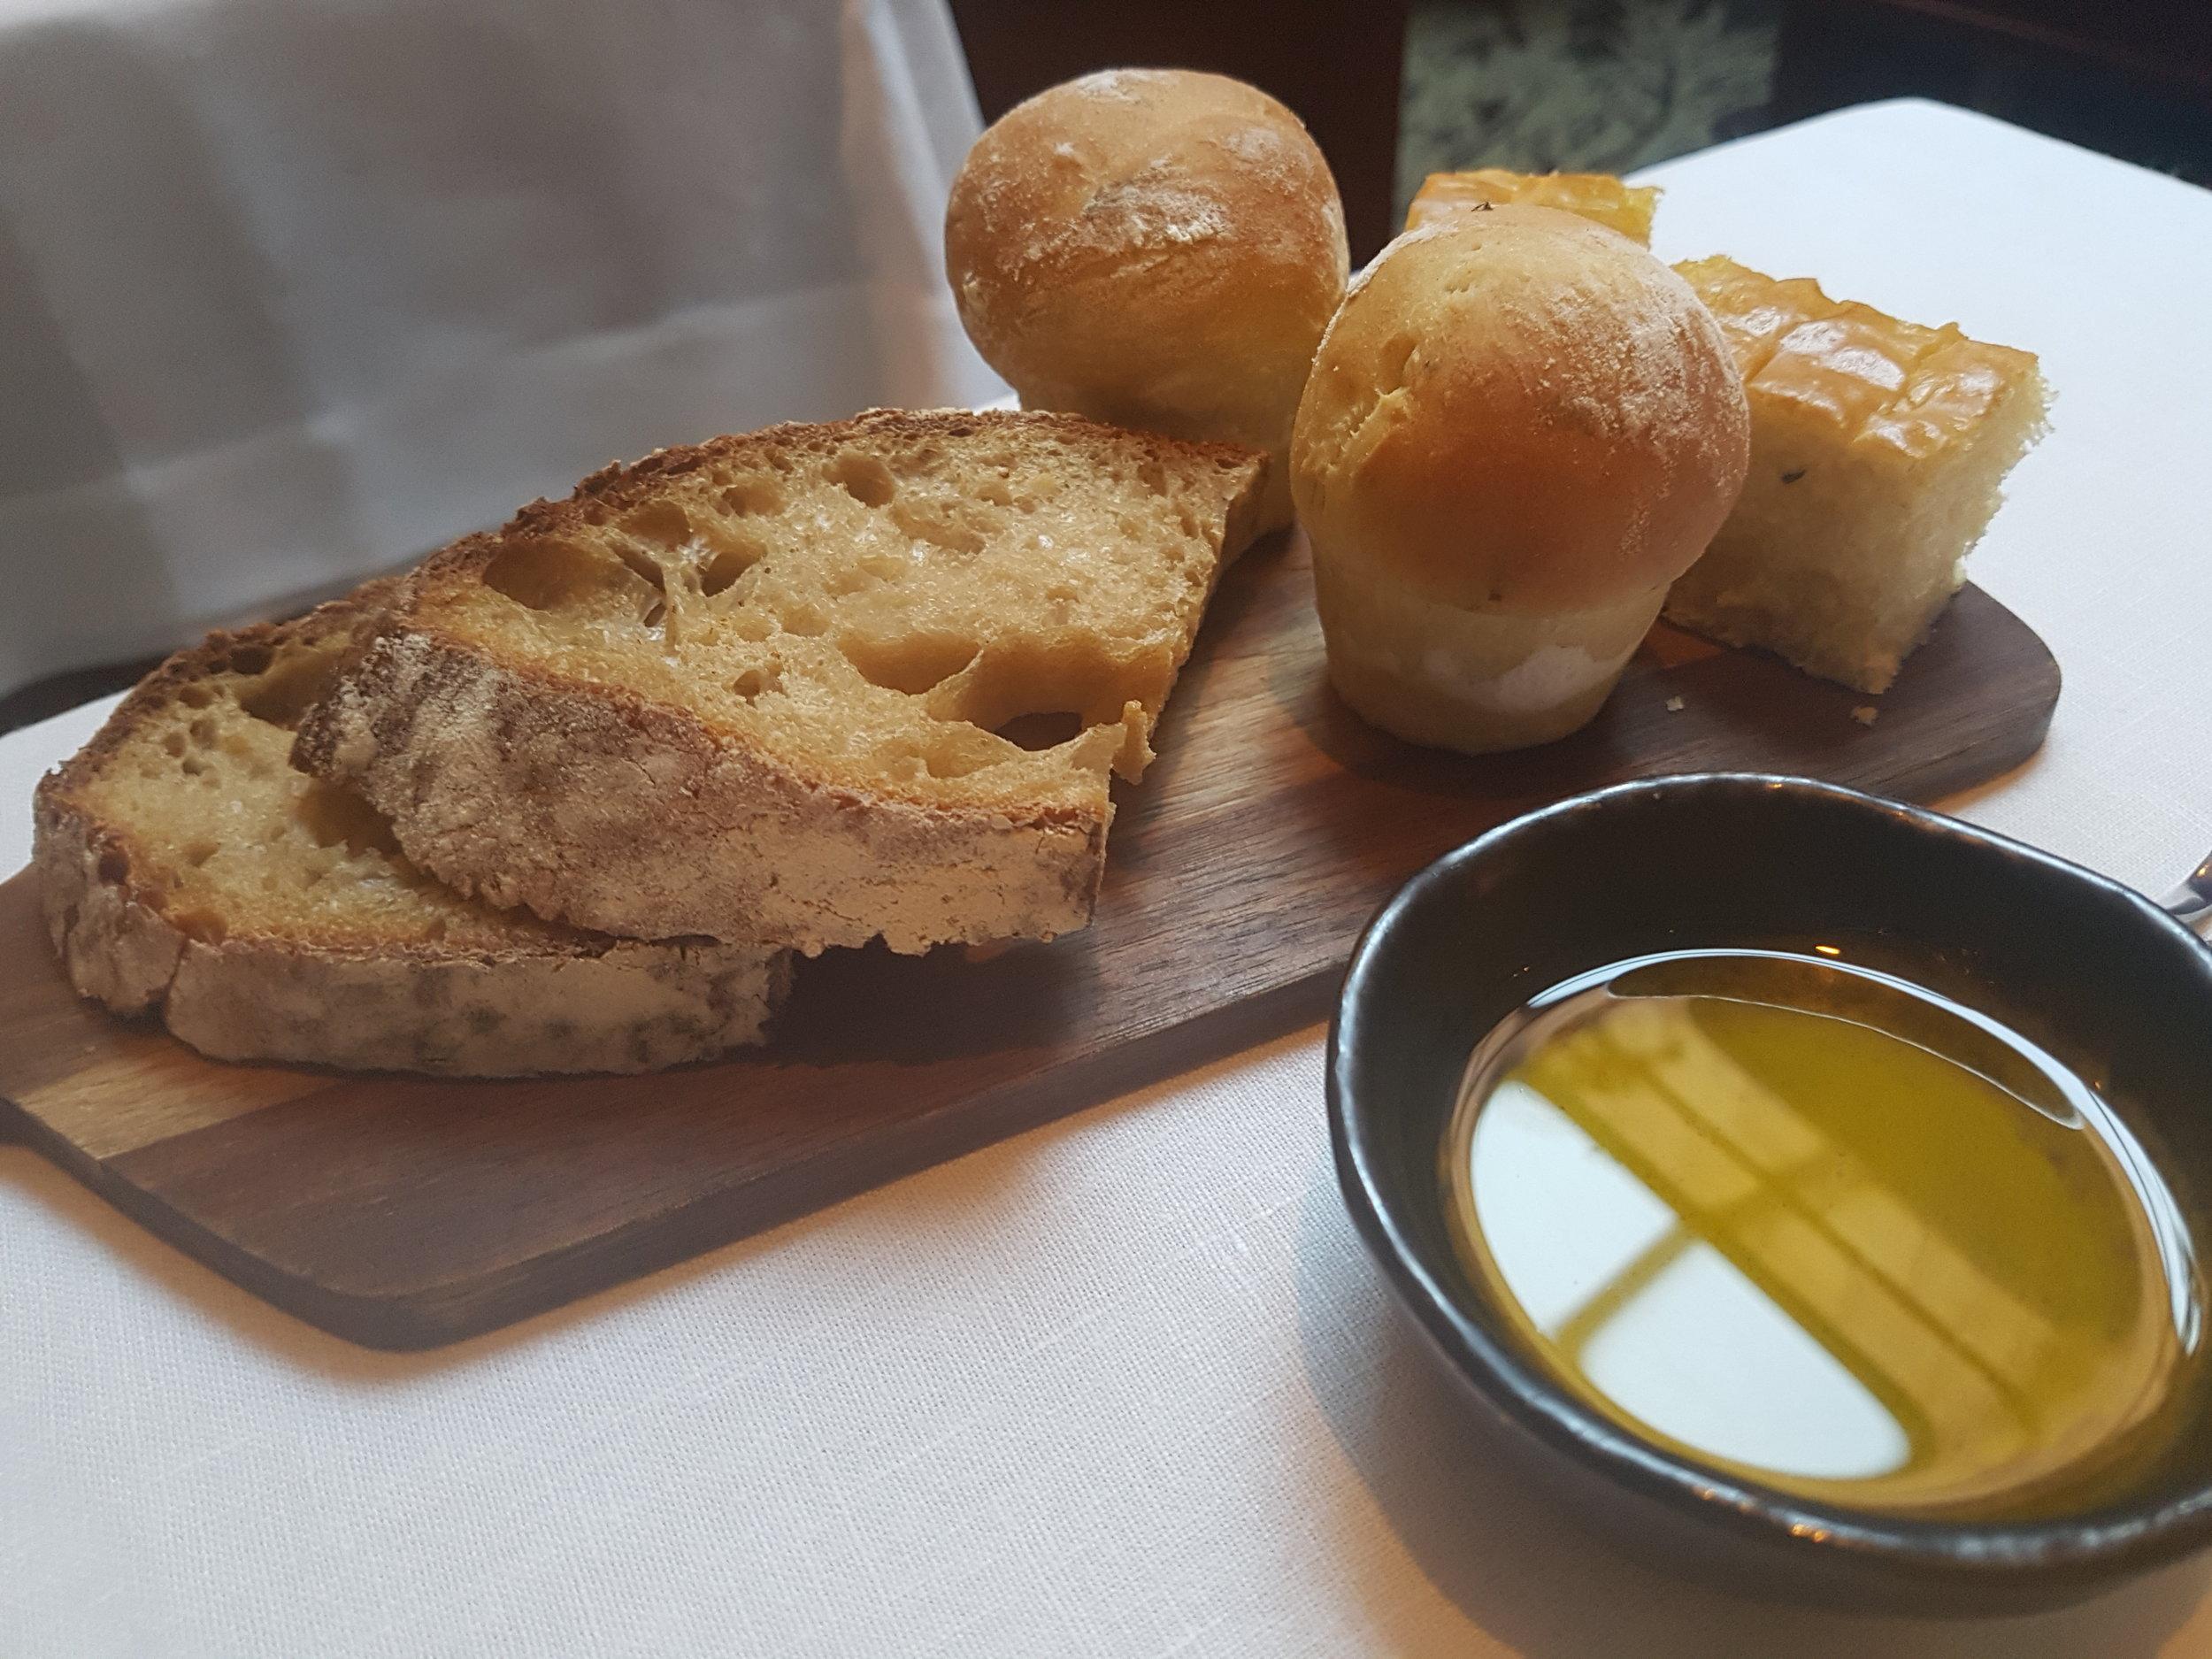 From the vegan tasting menu at Pied à Terre